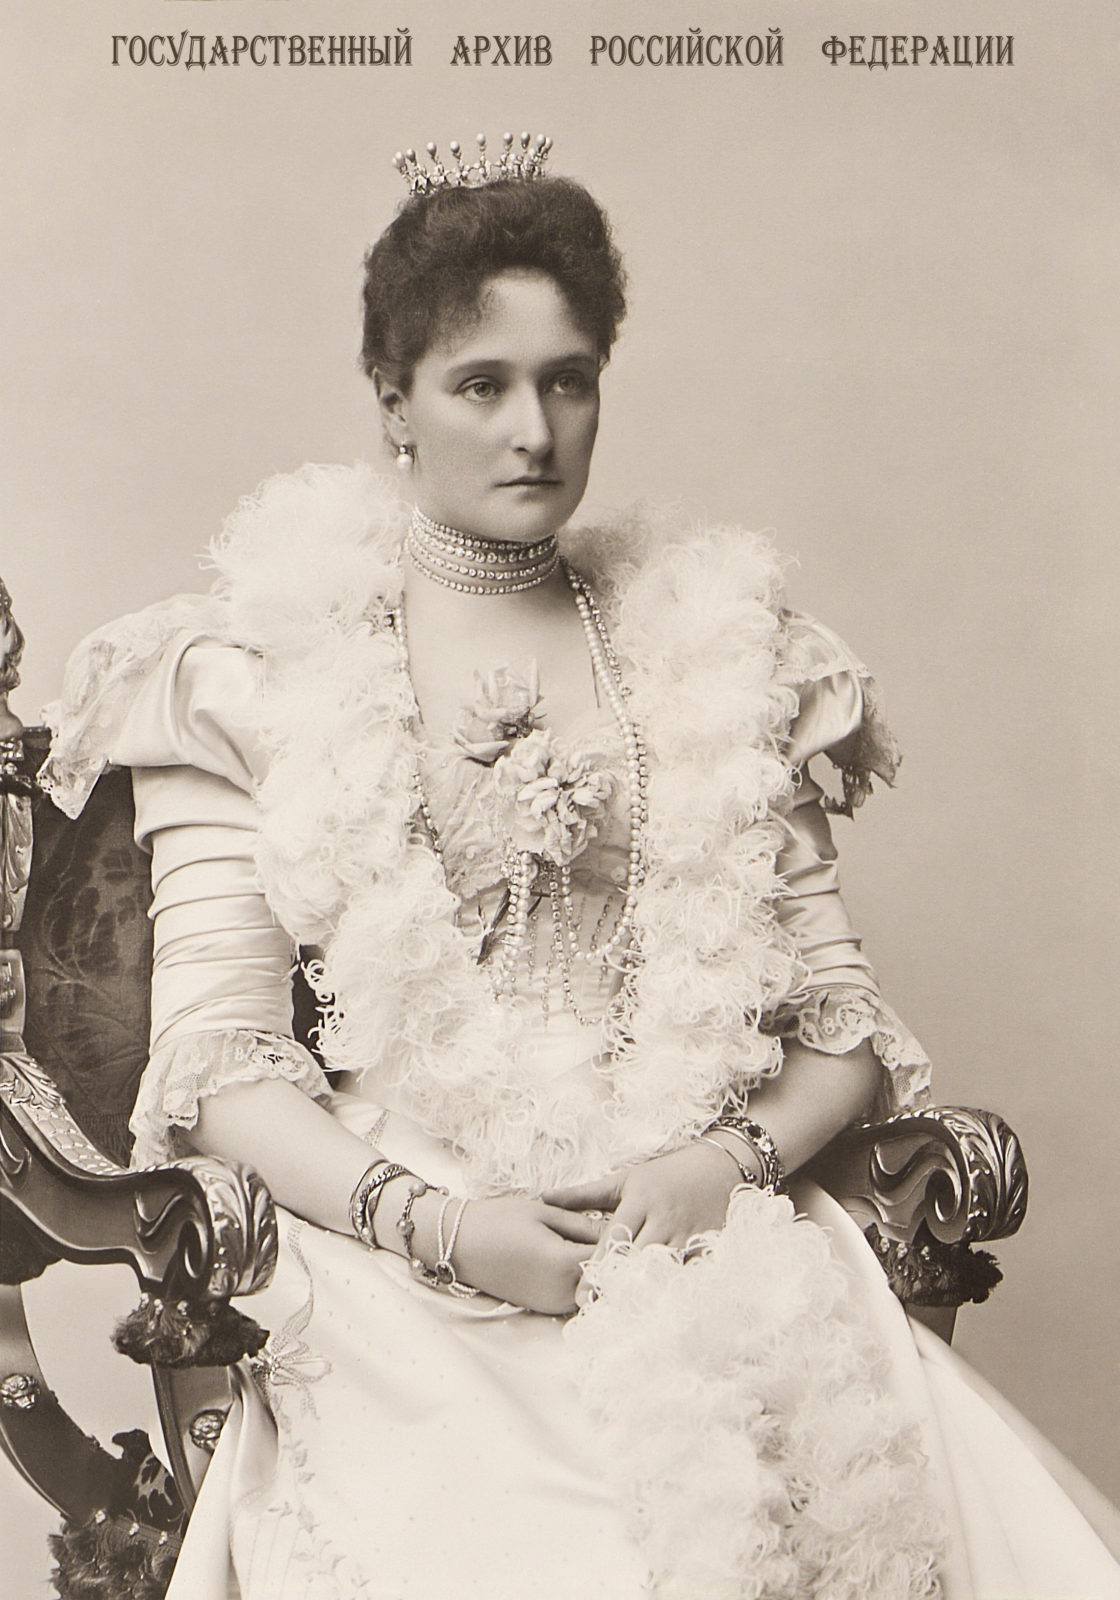 Empress Alexandra Feodorovna . 1898.